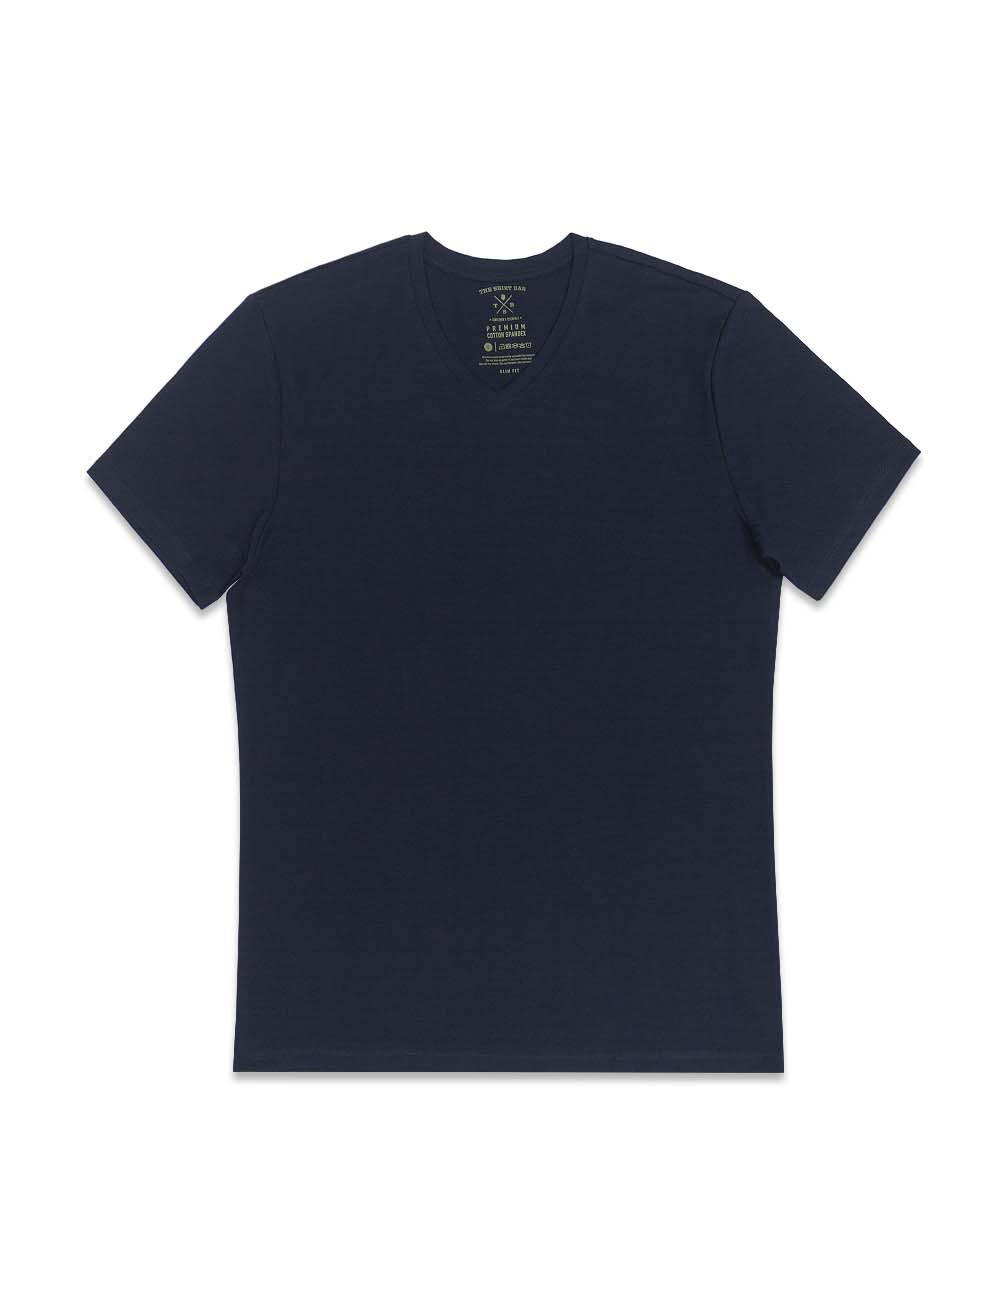 Navy Premium Cotton Stretch V Neck Slim Fit T-Shirt – TS3A3.3